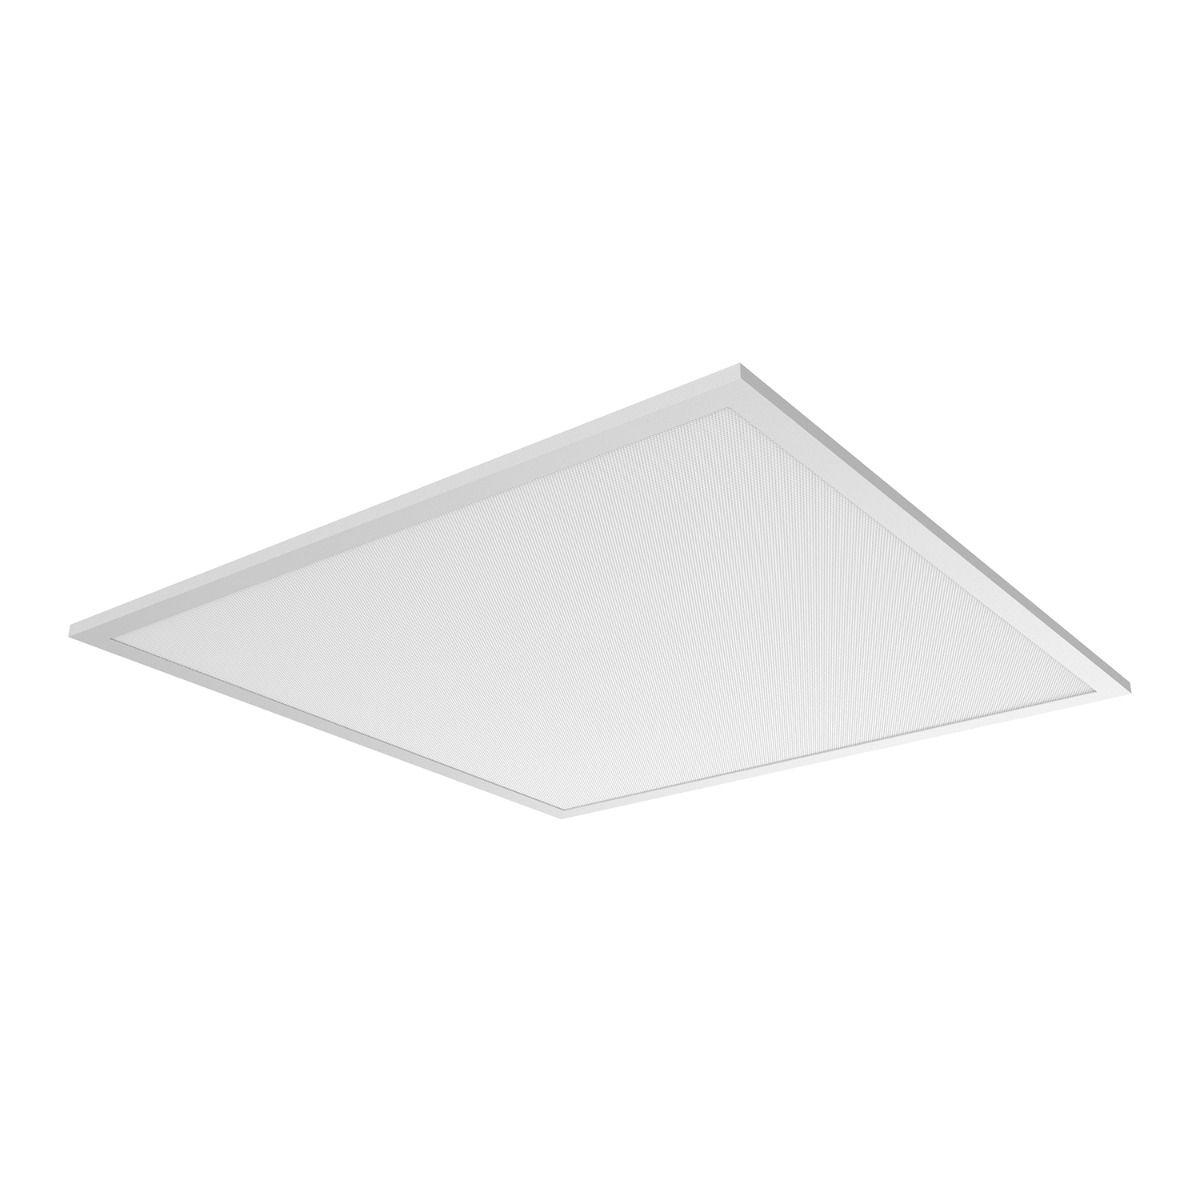 Noxion LED Panel Delta Pro V3 DALI 30W 3000K 3960lm 60x60cm UGR <22 | Warm White - Replaces 4x18W